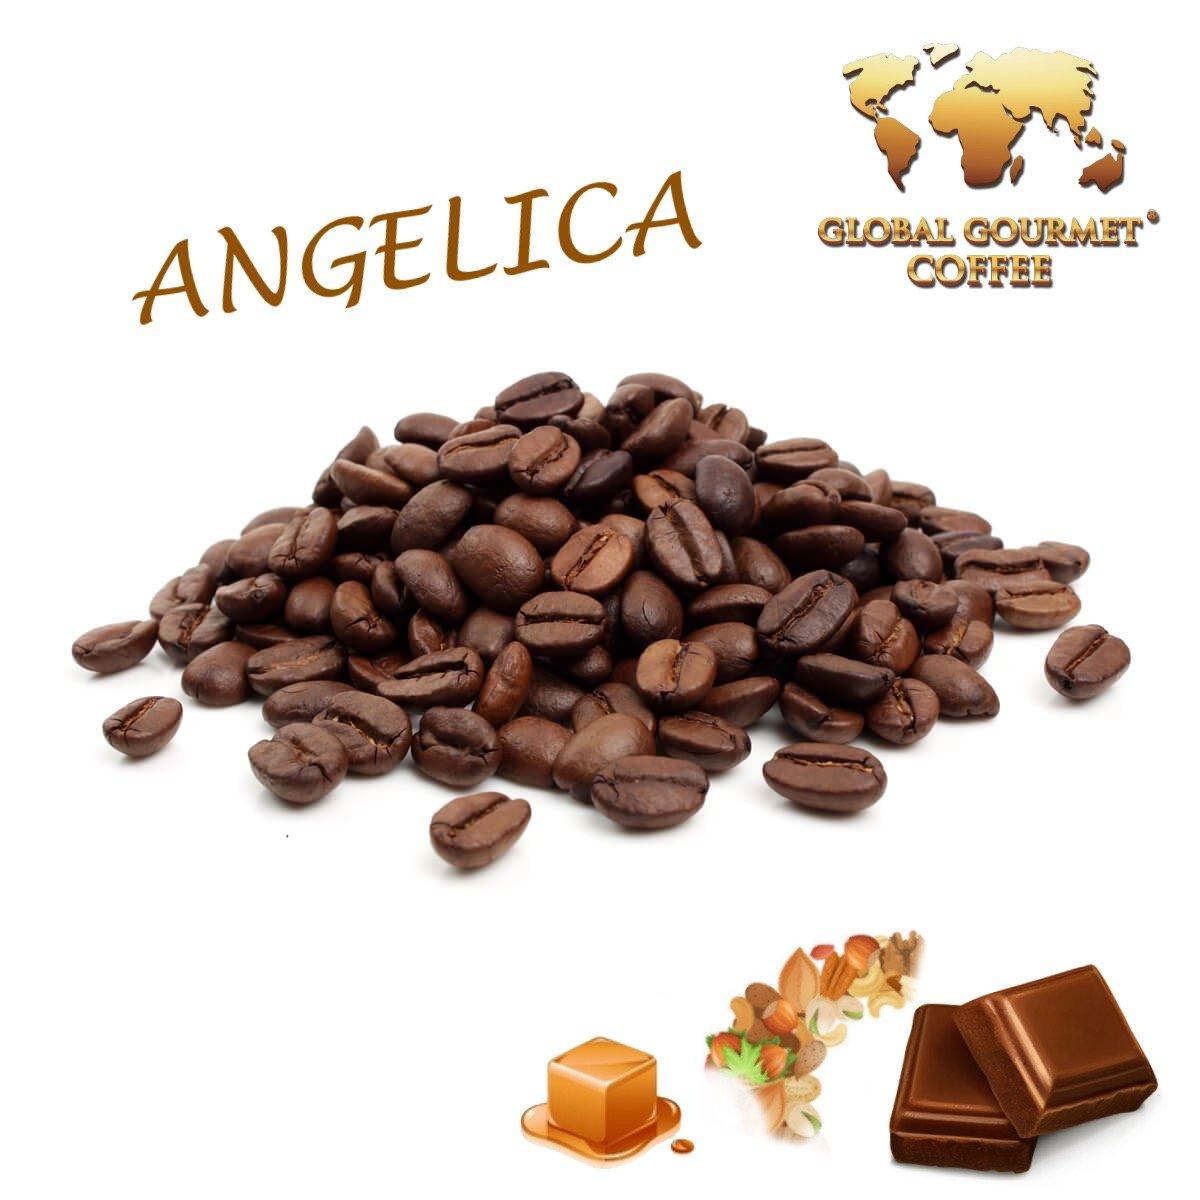 Amazon.com : Flavored Coffee (DULCE DE LECHE Flavored Coffee, 1lb Ground) : Ground Coffee : Grocery & Gourmet Food